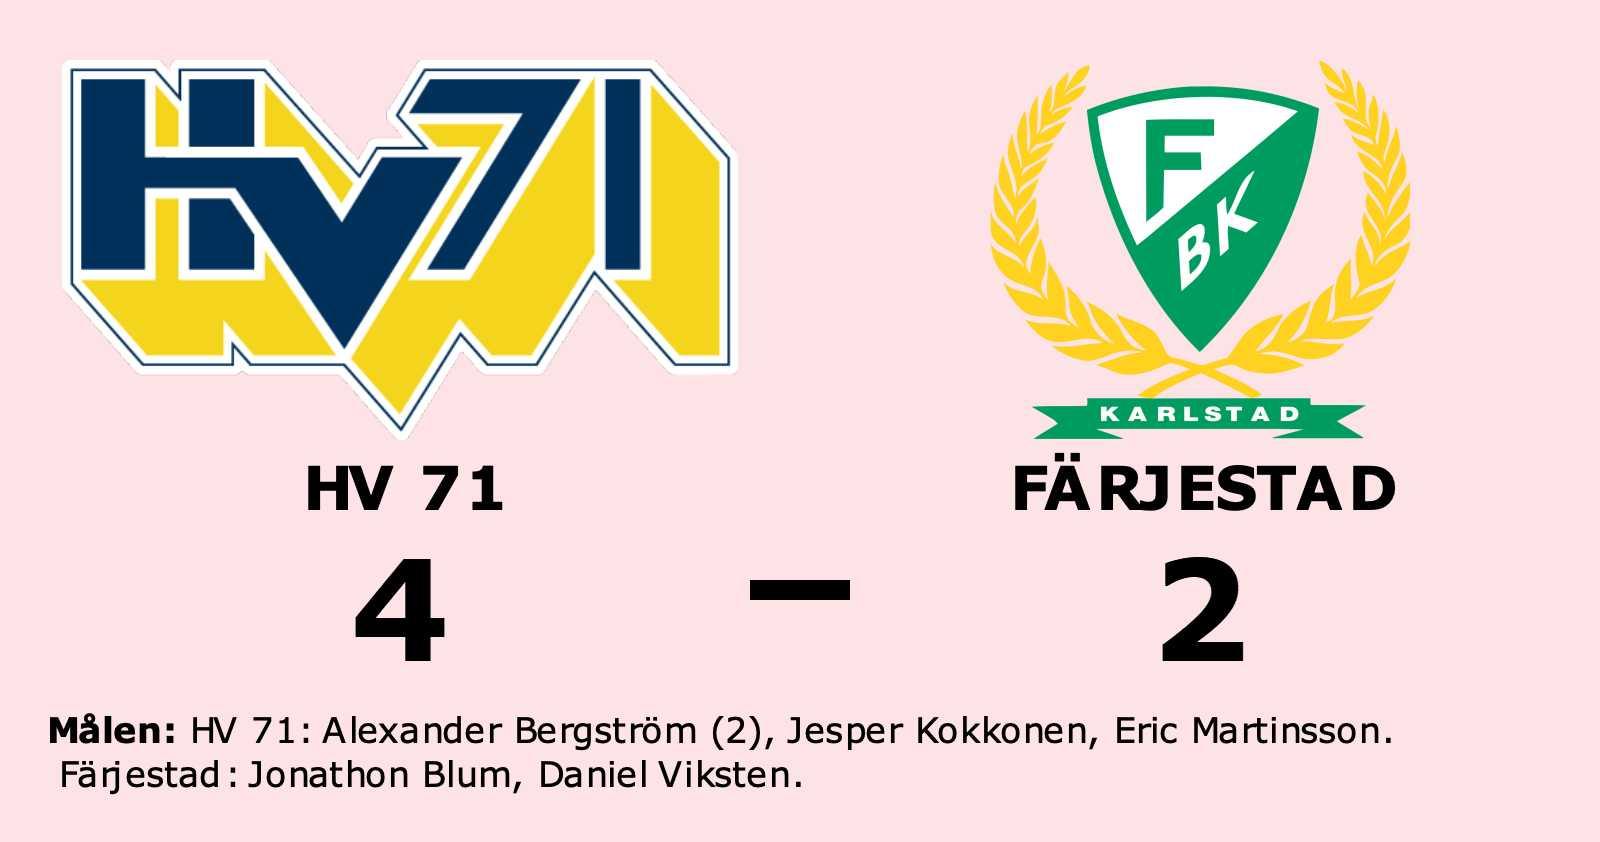 HV 71 vann efter Alexander Bergströms dubbel